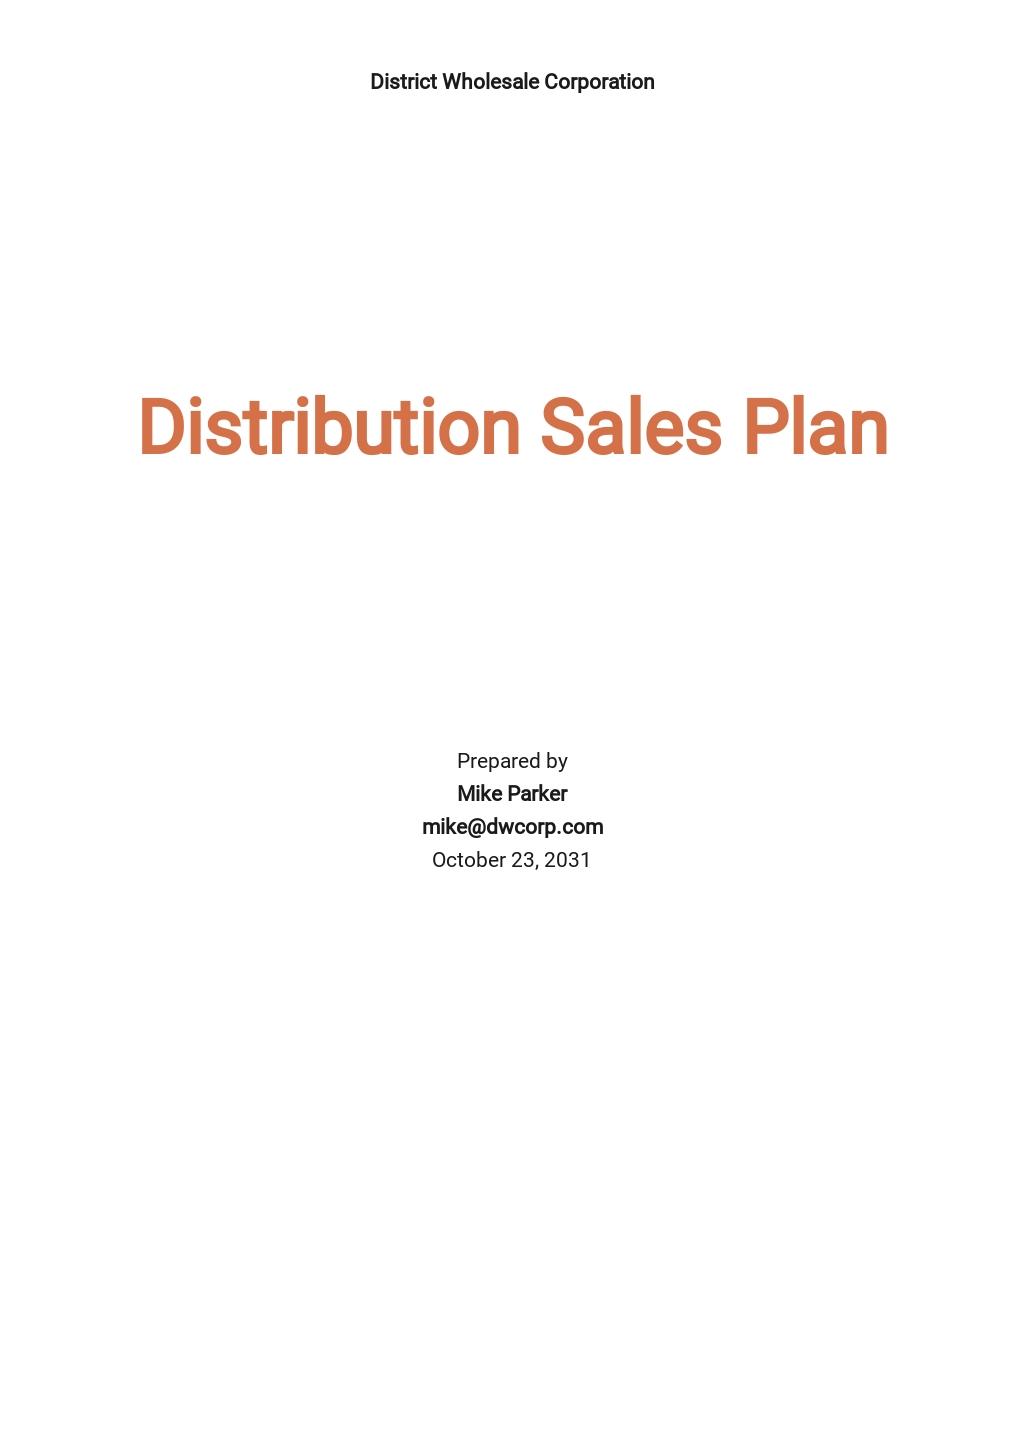 Distribution Sales Plan Template.jpe